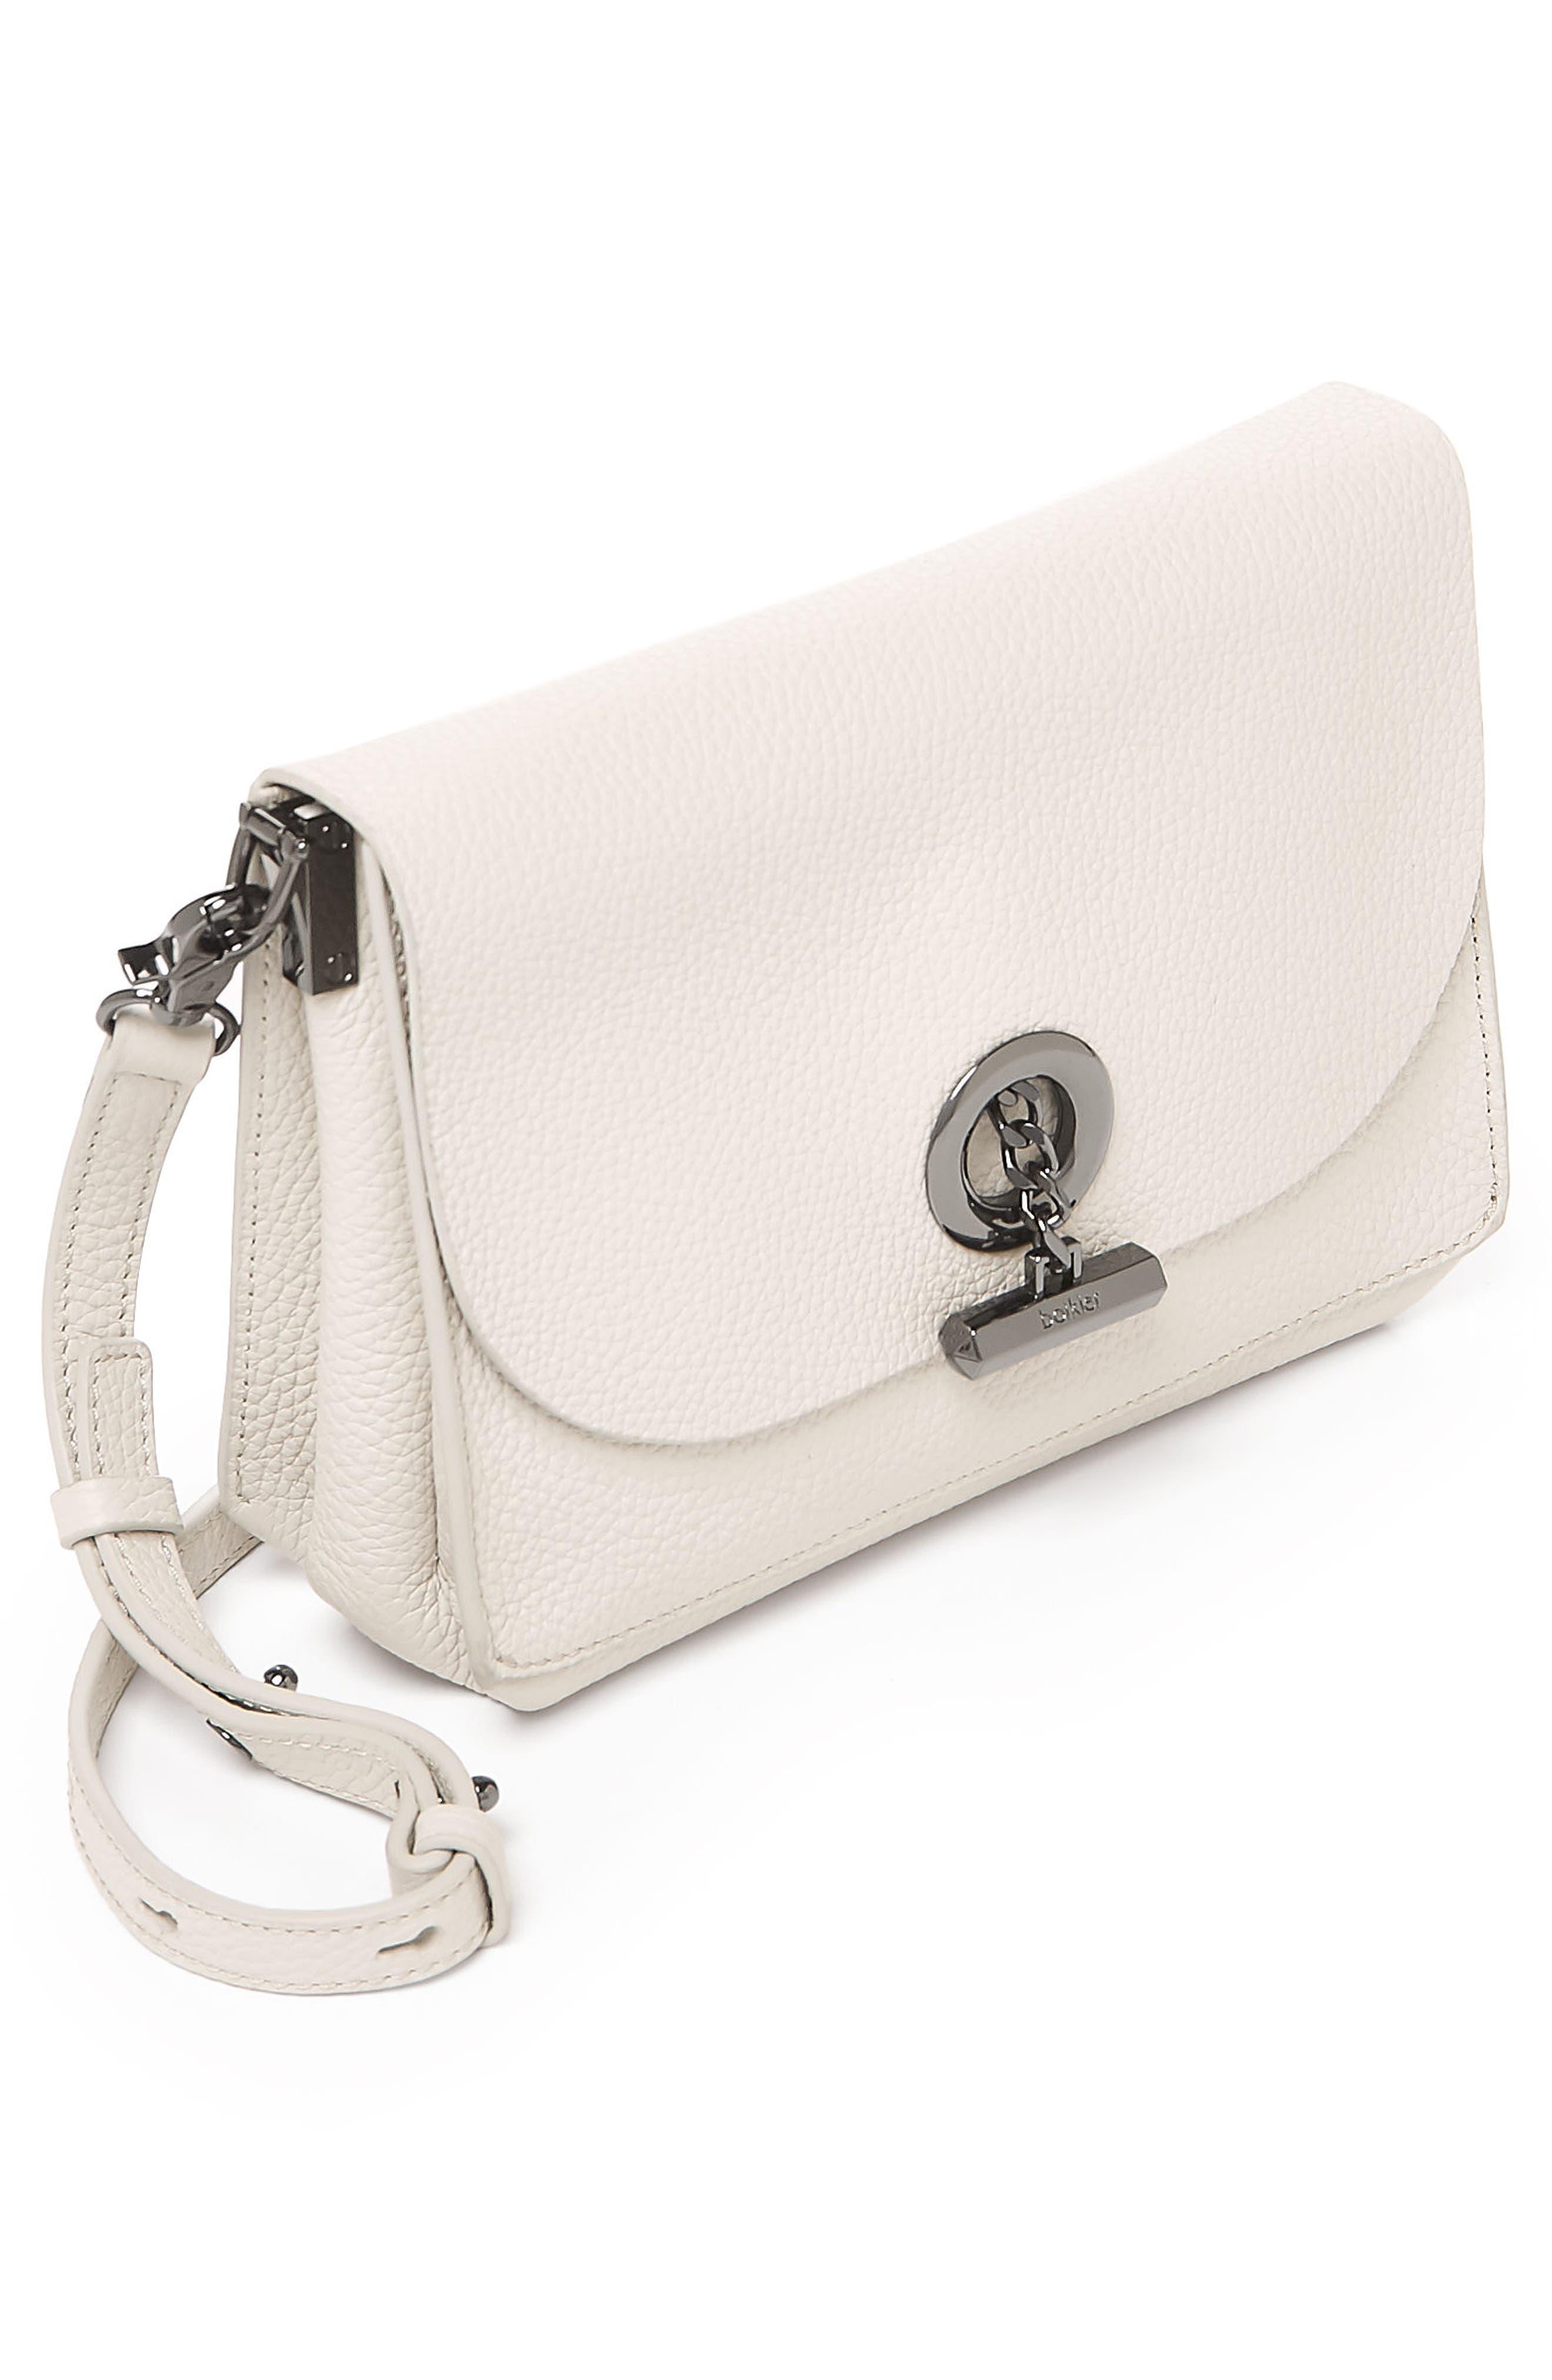 Waverly Leather Crossbody Bag,                             Alternate thumbnail 27, color,